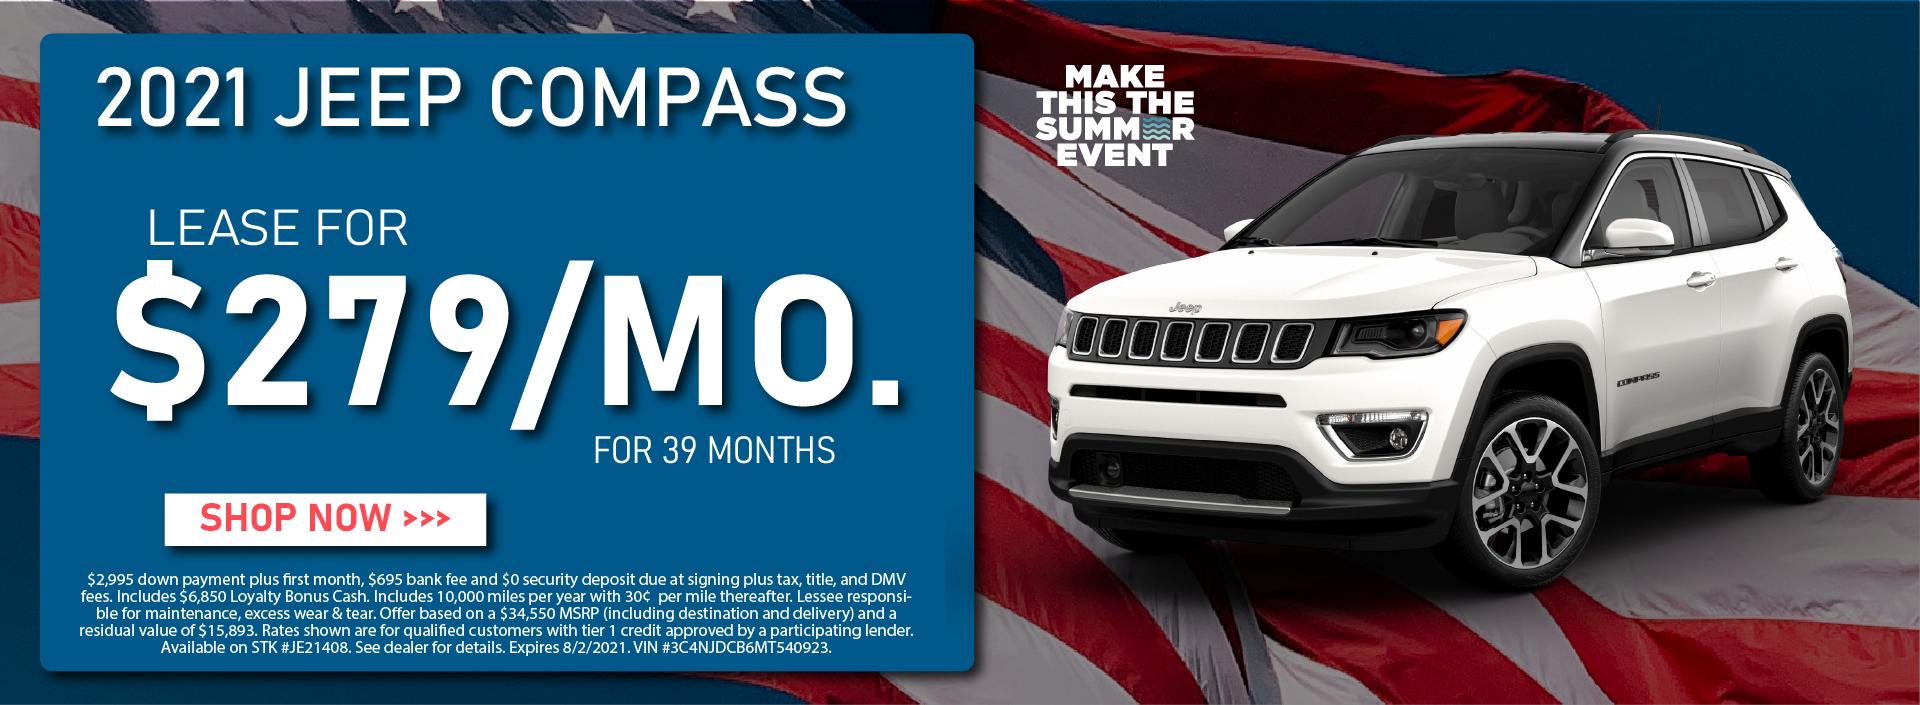 CDJR Manhattan – July 2021 – Jeep Compass